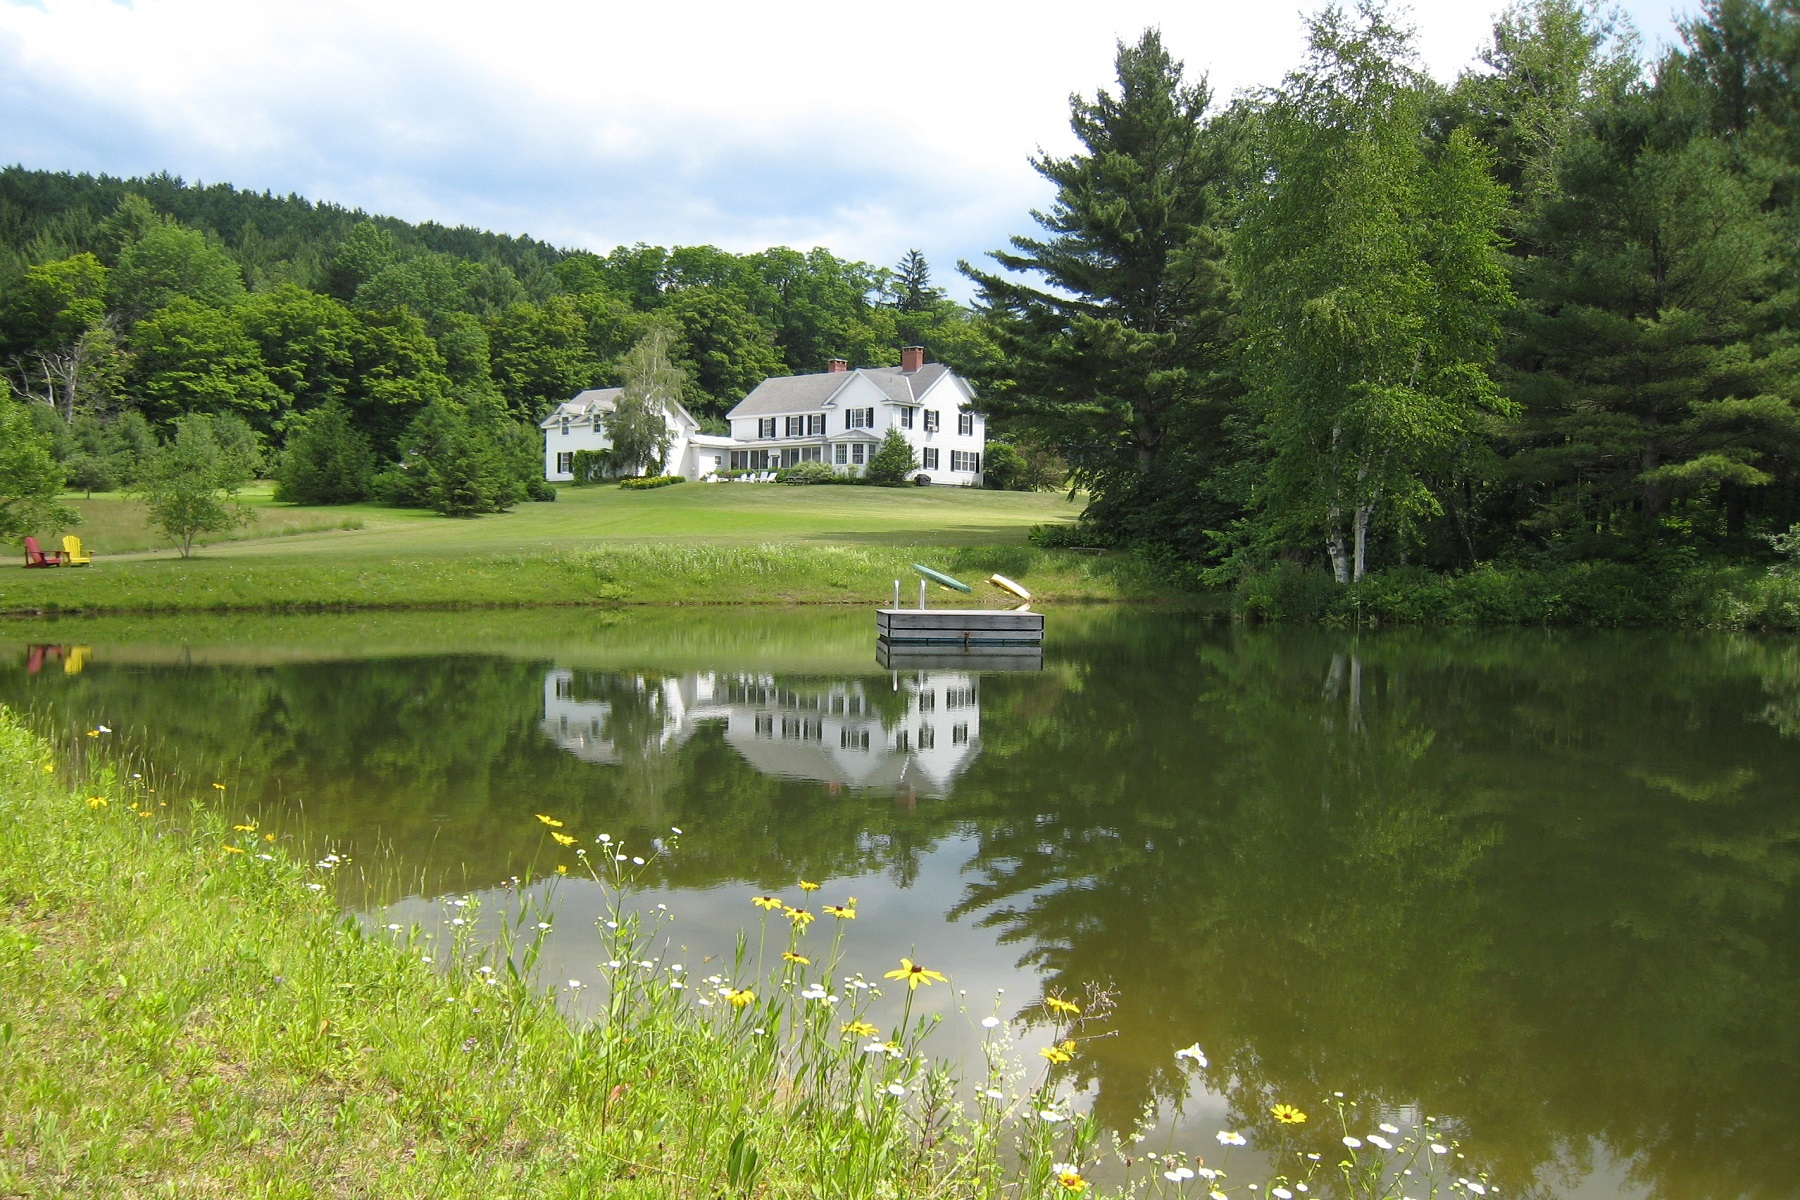 獨棟家庭住宅 為 出售 在 Remarkable Country Retreat 1491 Prosper Road Woodstock, 佛蒙特州, 05091 美國